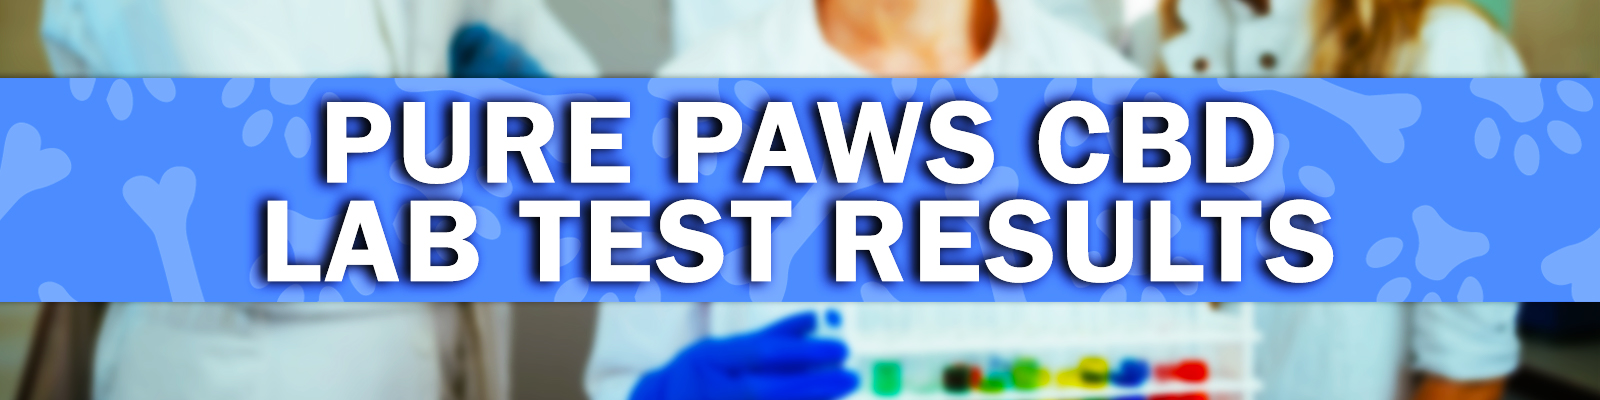 pure paws hemp cbd products lab test results